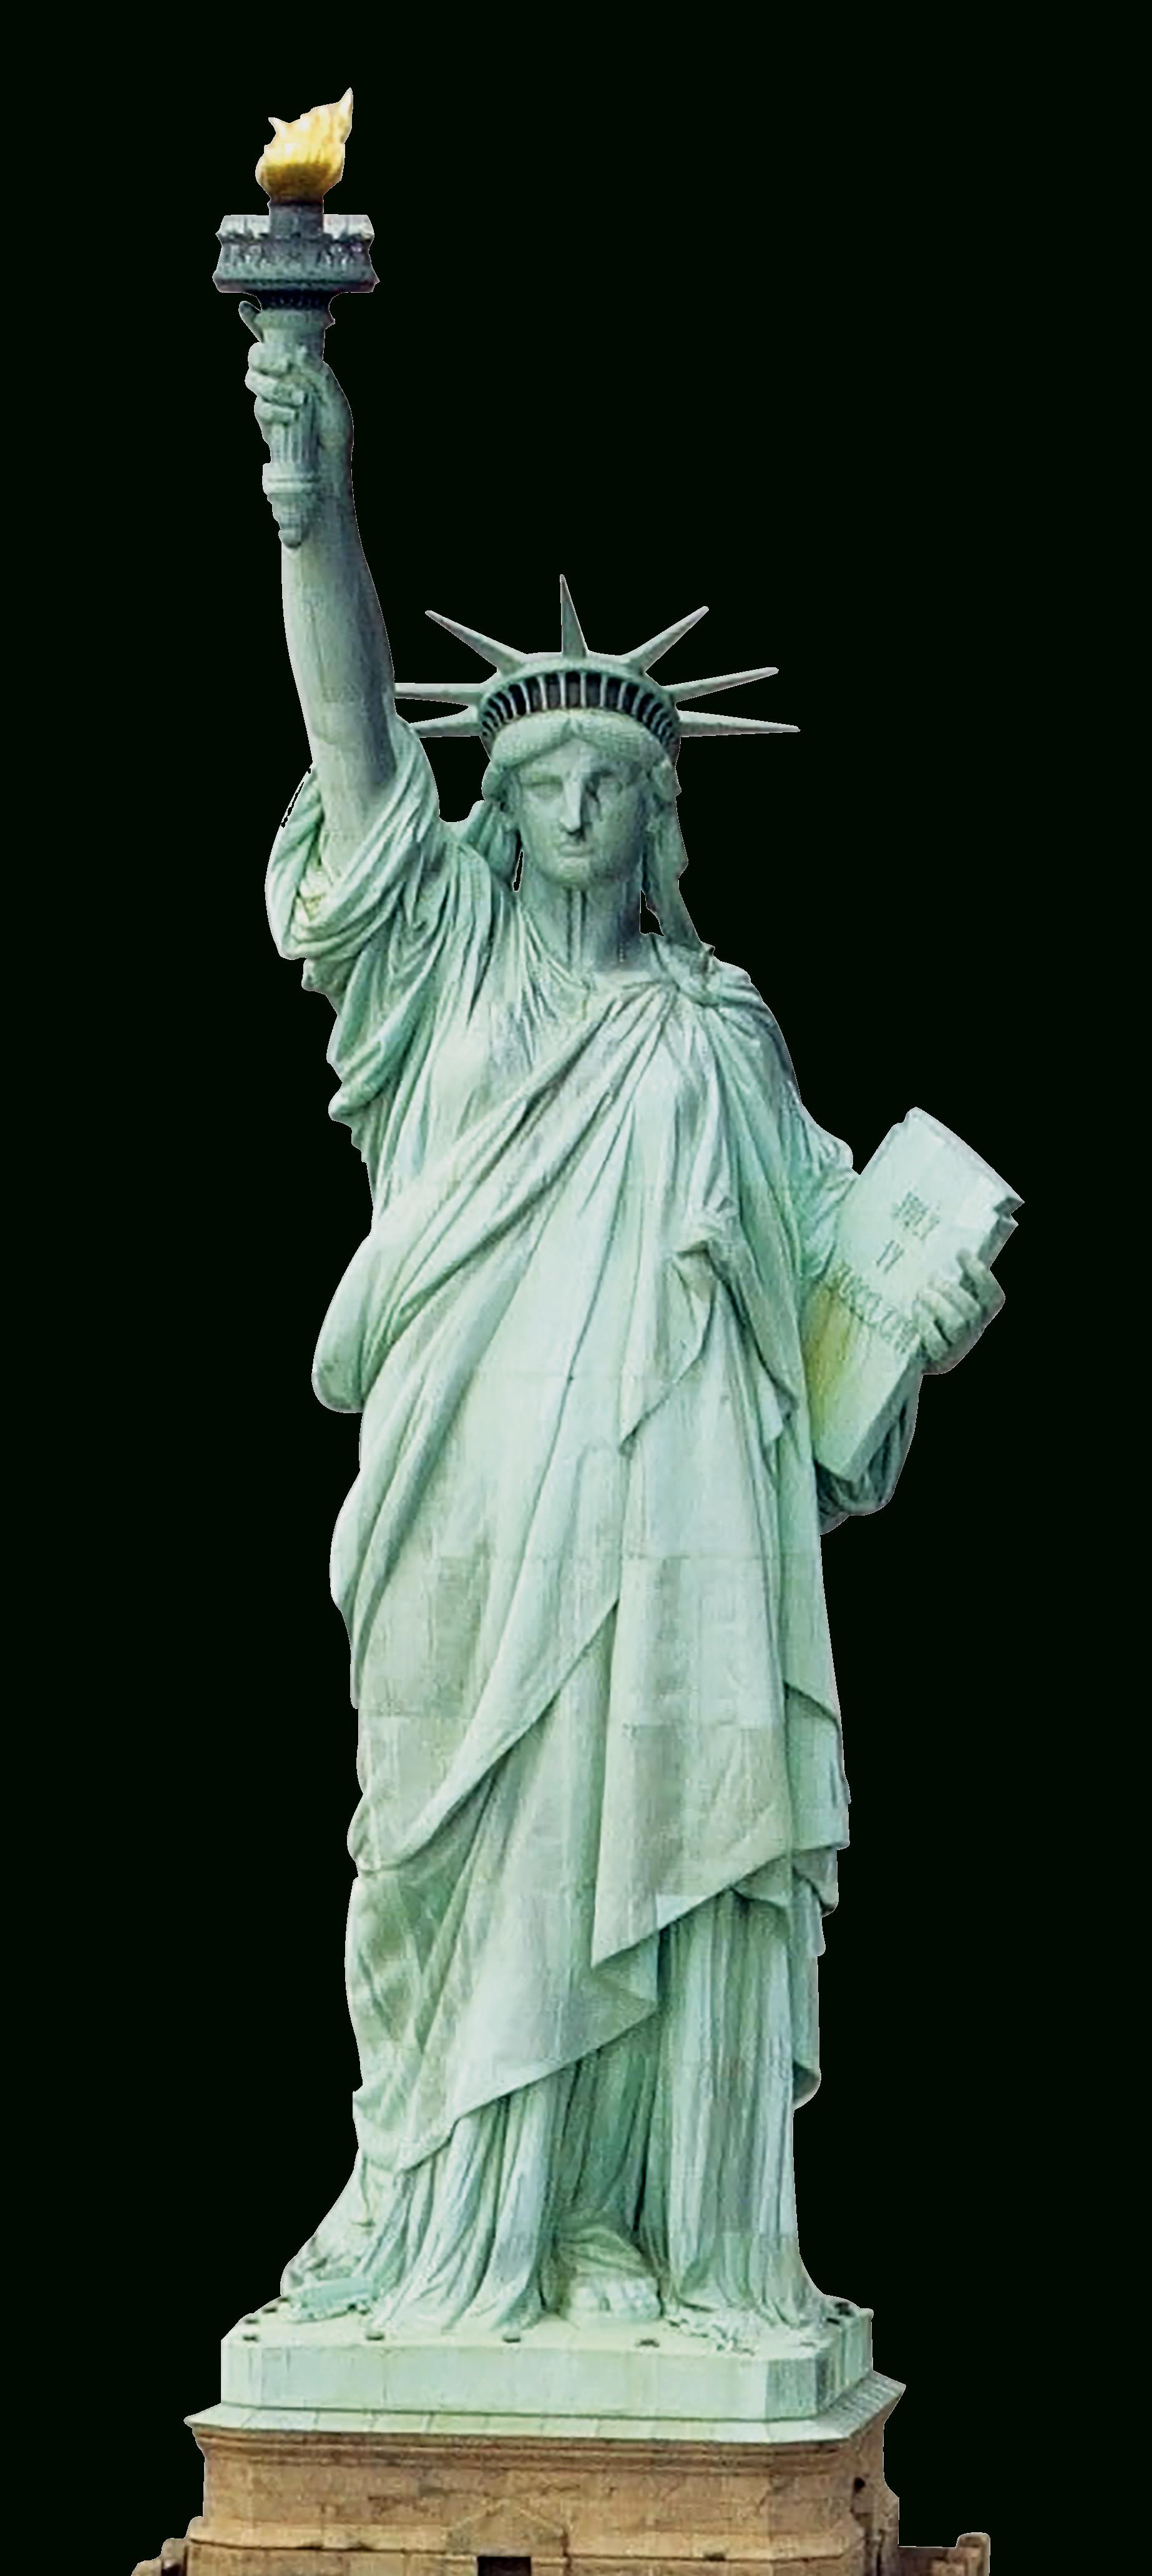 happy birthday lady liberty - usa today